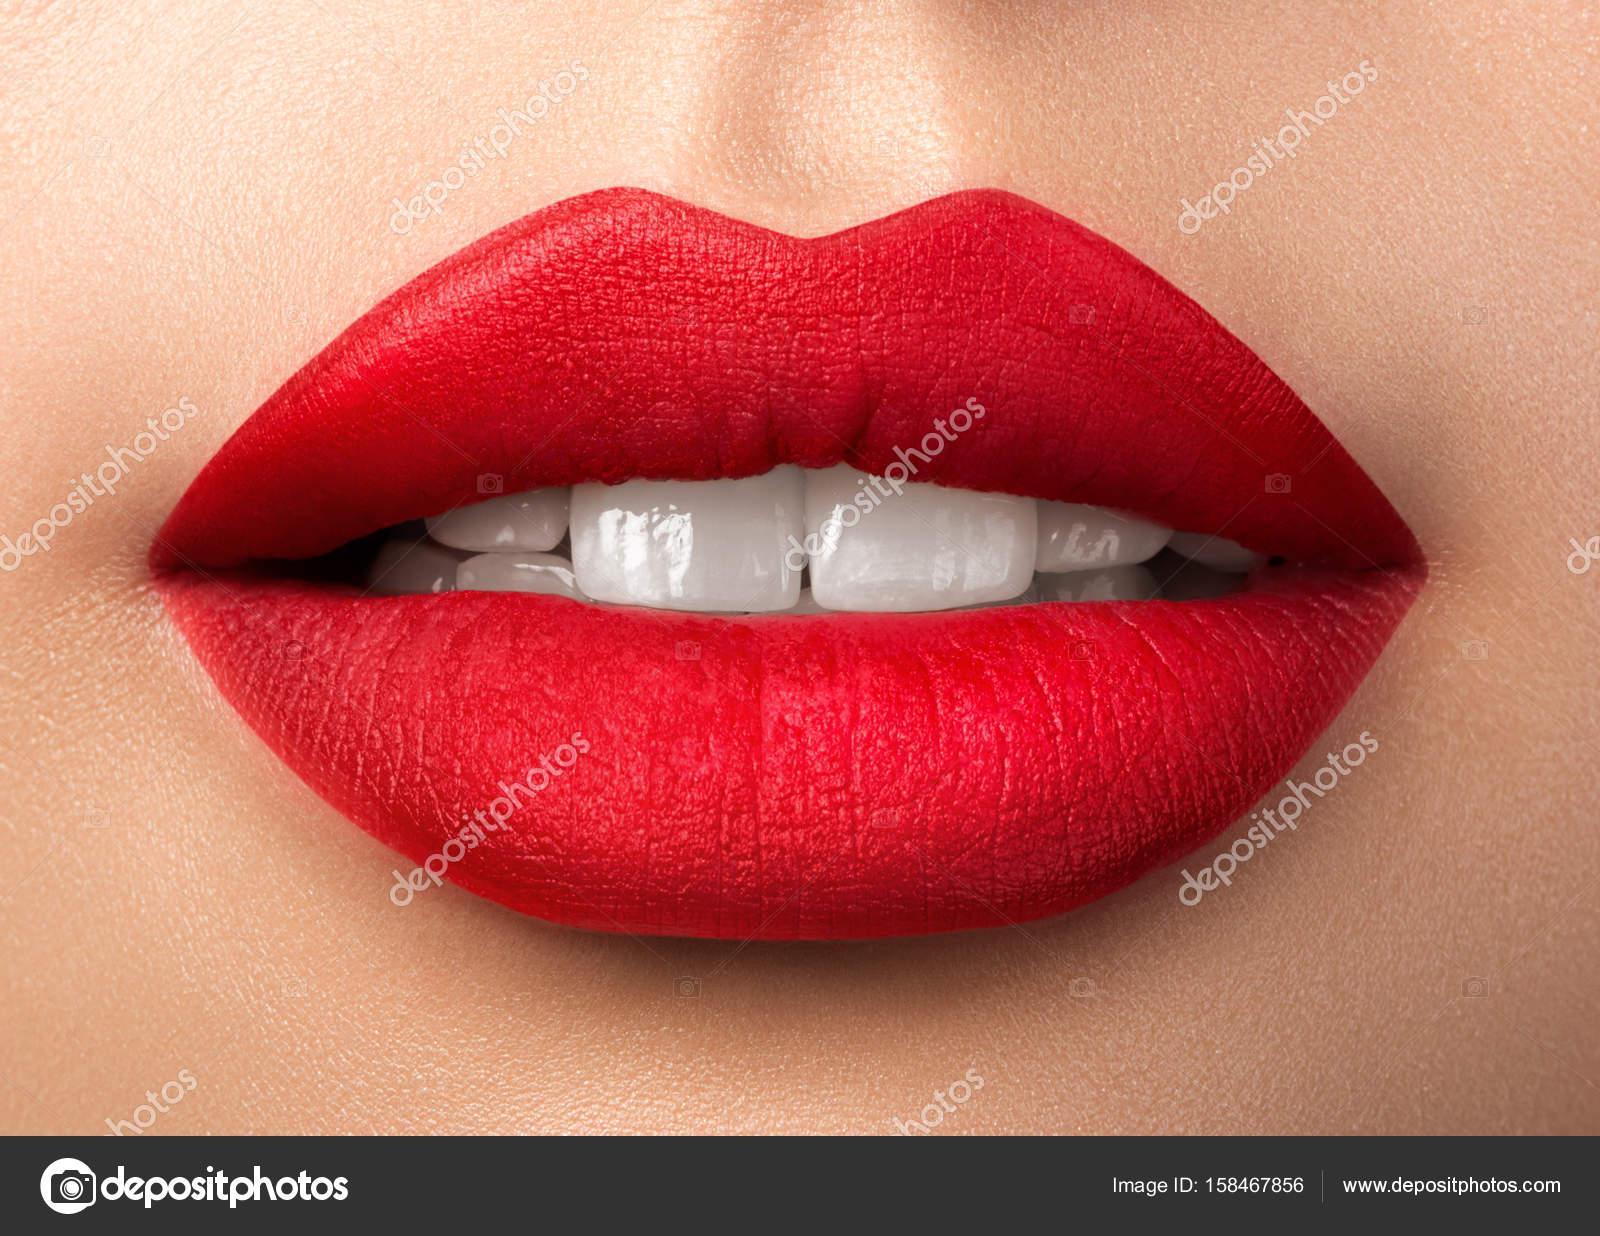 Nahaufnahme Der Schonen Frau Lippen Mit Rotem Lippenstift Matt